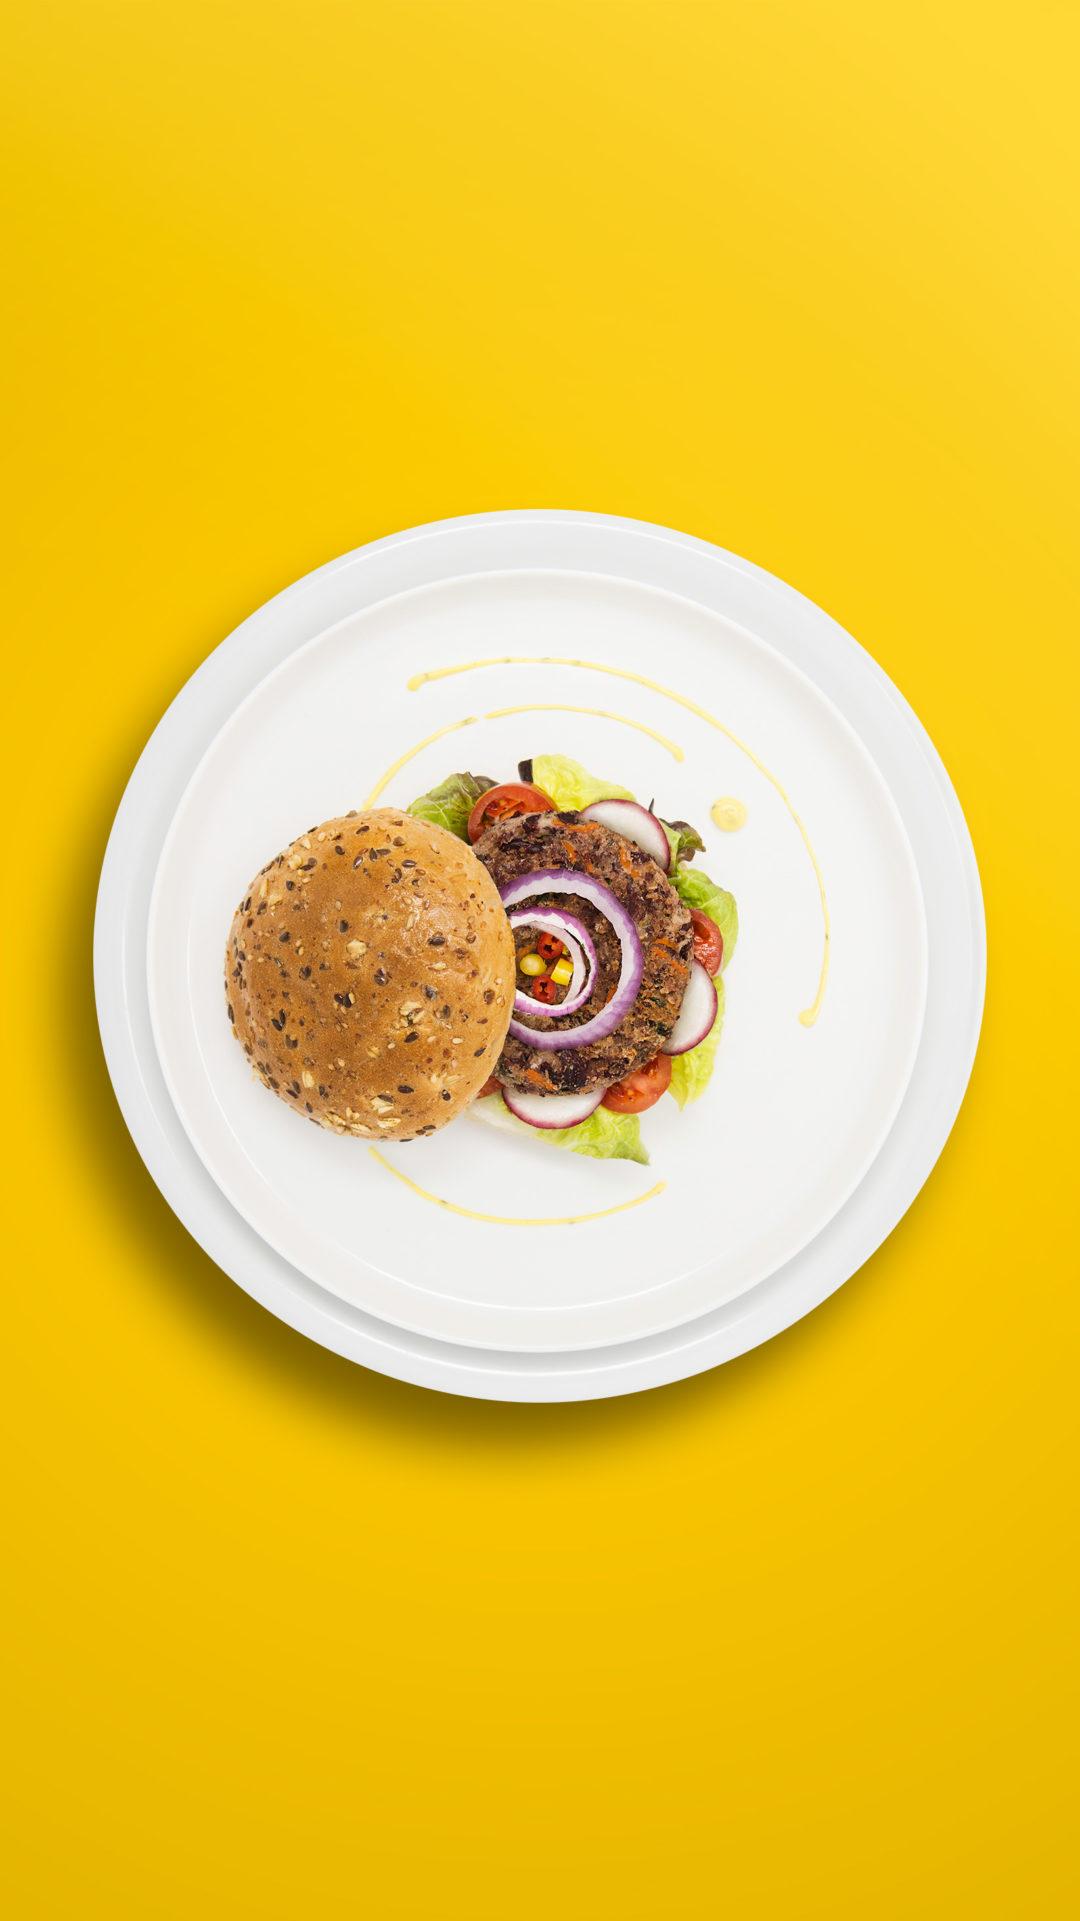 Hamburger aus roten Bohnen (ca. 8 Hamburger)